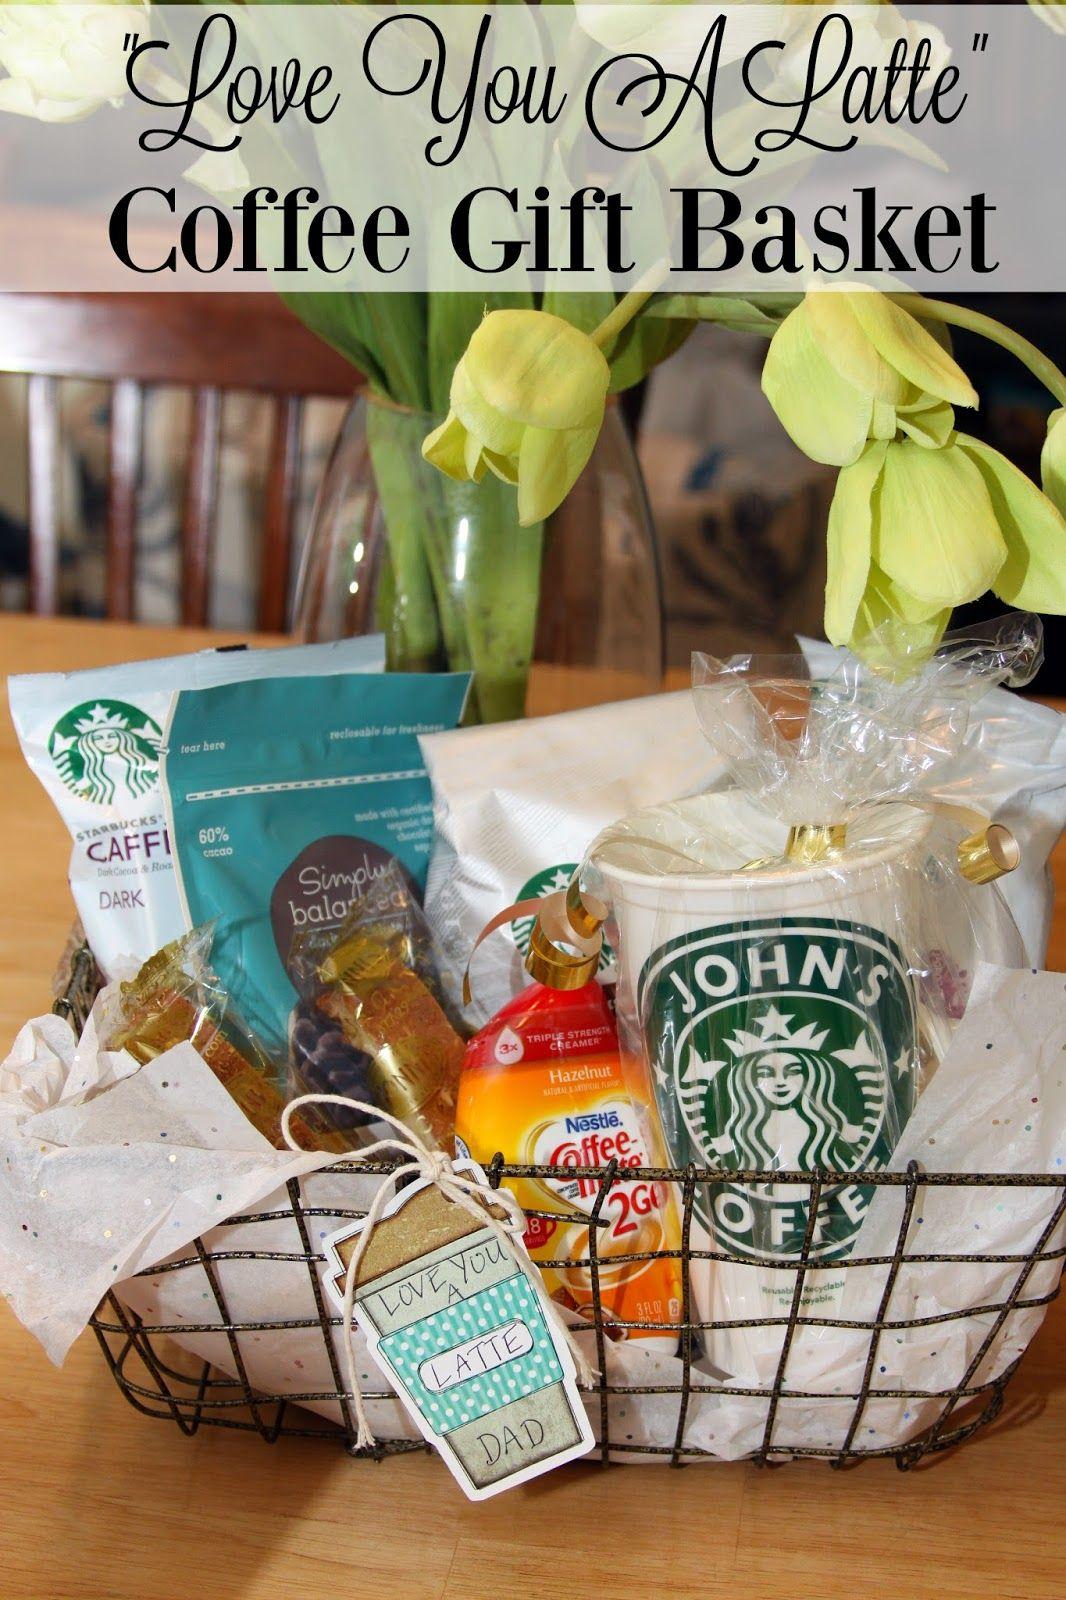 Ninja Coffee Bar And Love You A Latte Gift Basket Coffee Lovers Basket Coffee Gift Basket Coffee Gift Baskets